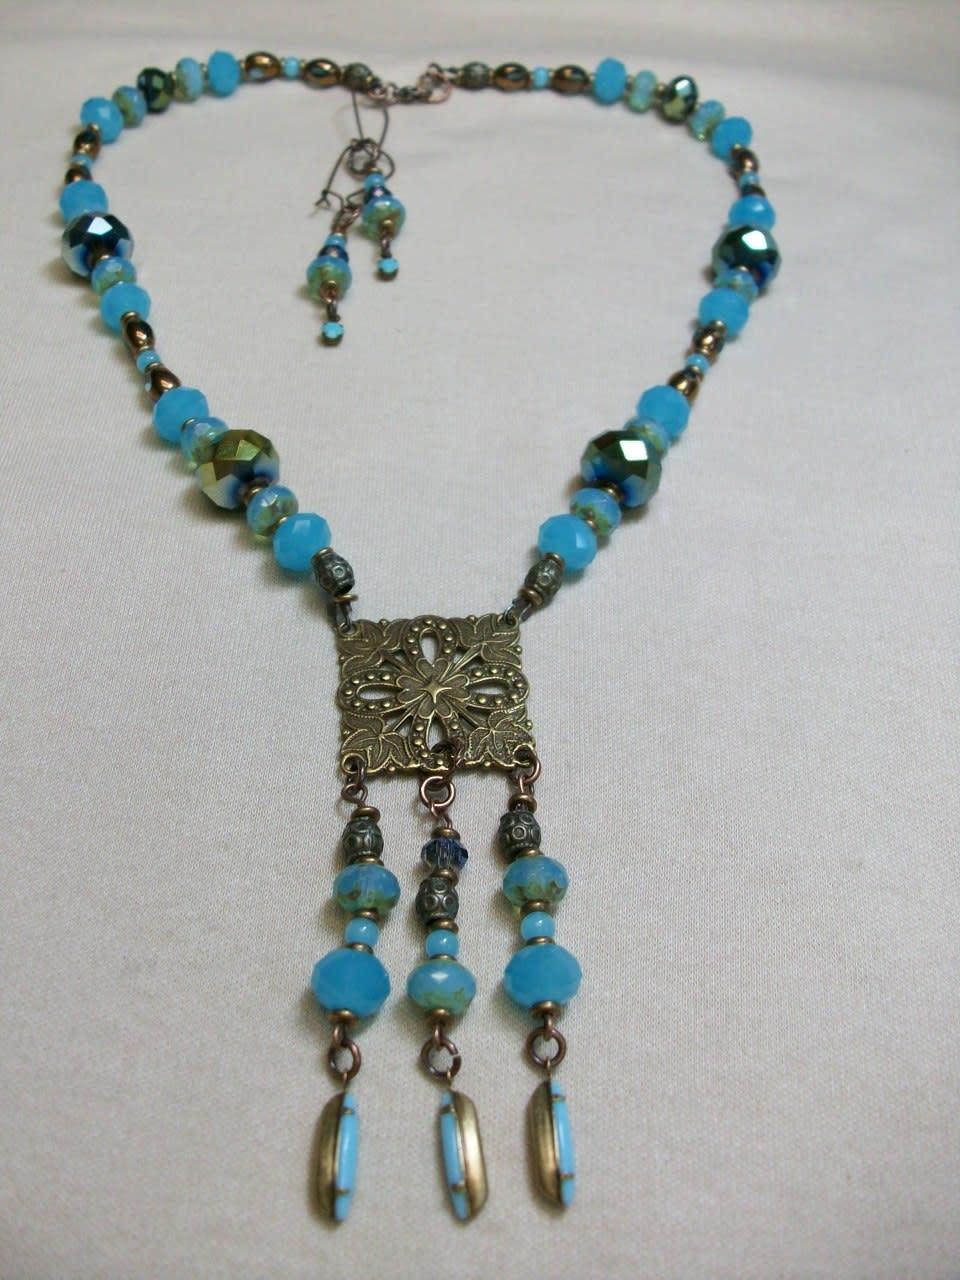 Sharon B's Originals Antique Gold Square Medallion w/ 3 Blue Drops Necklace & Earring Set